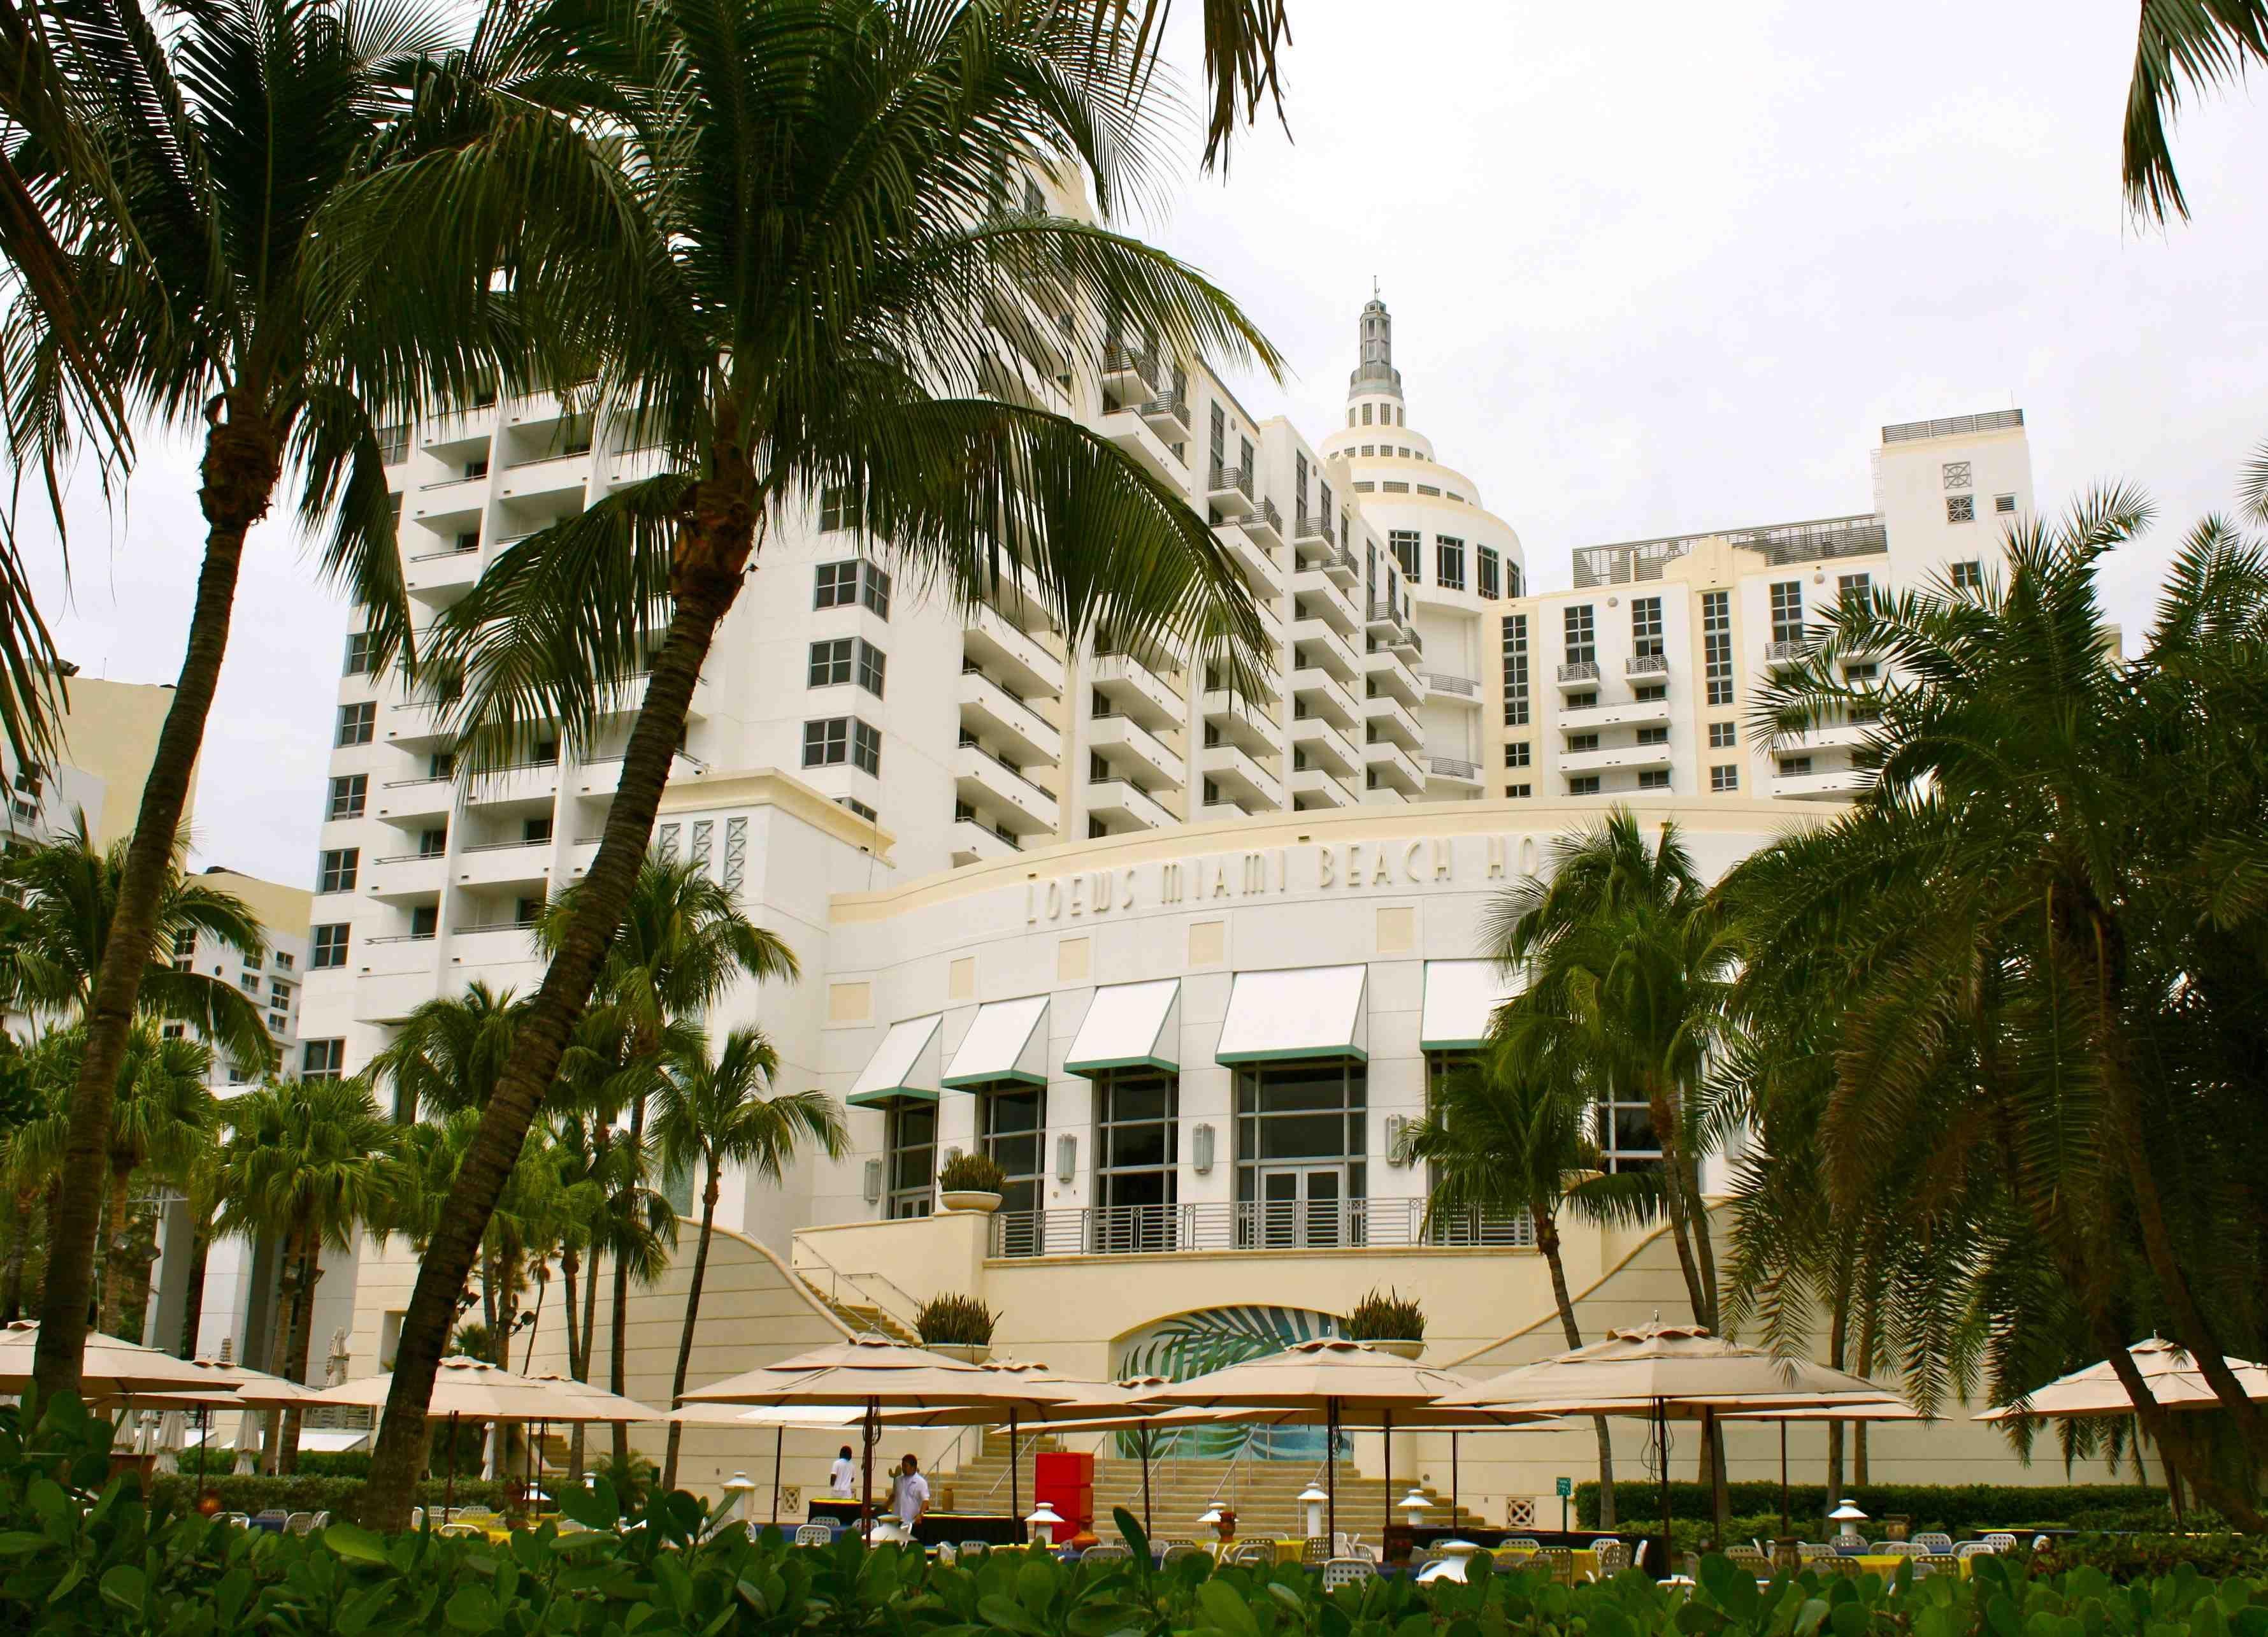 Lowes Miami Beach Hotel Resort Florida South